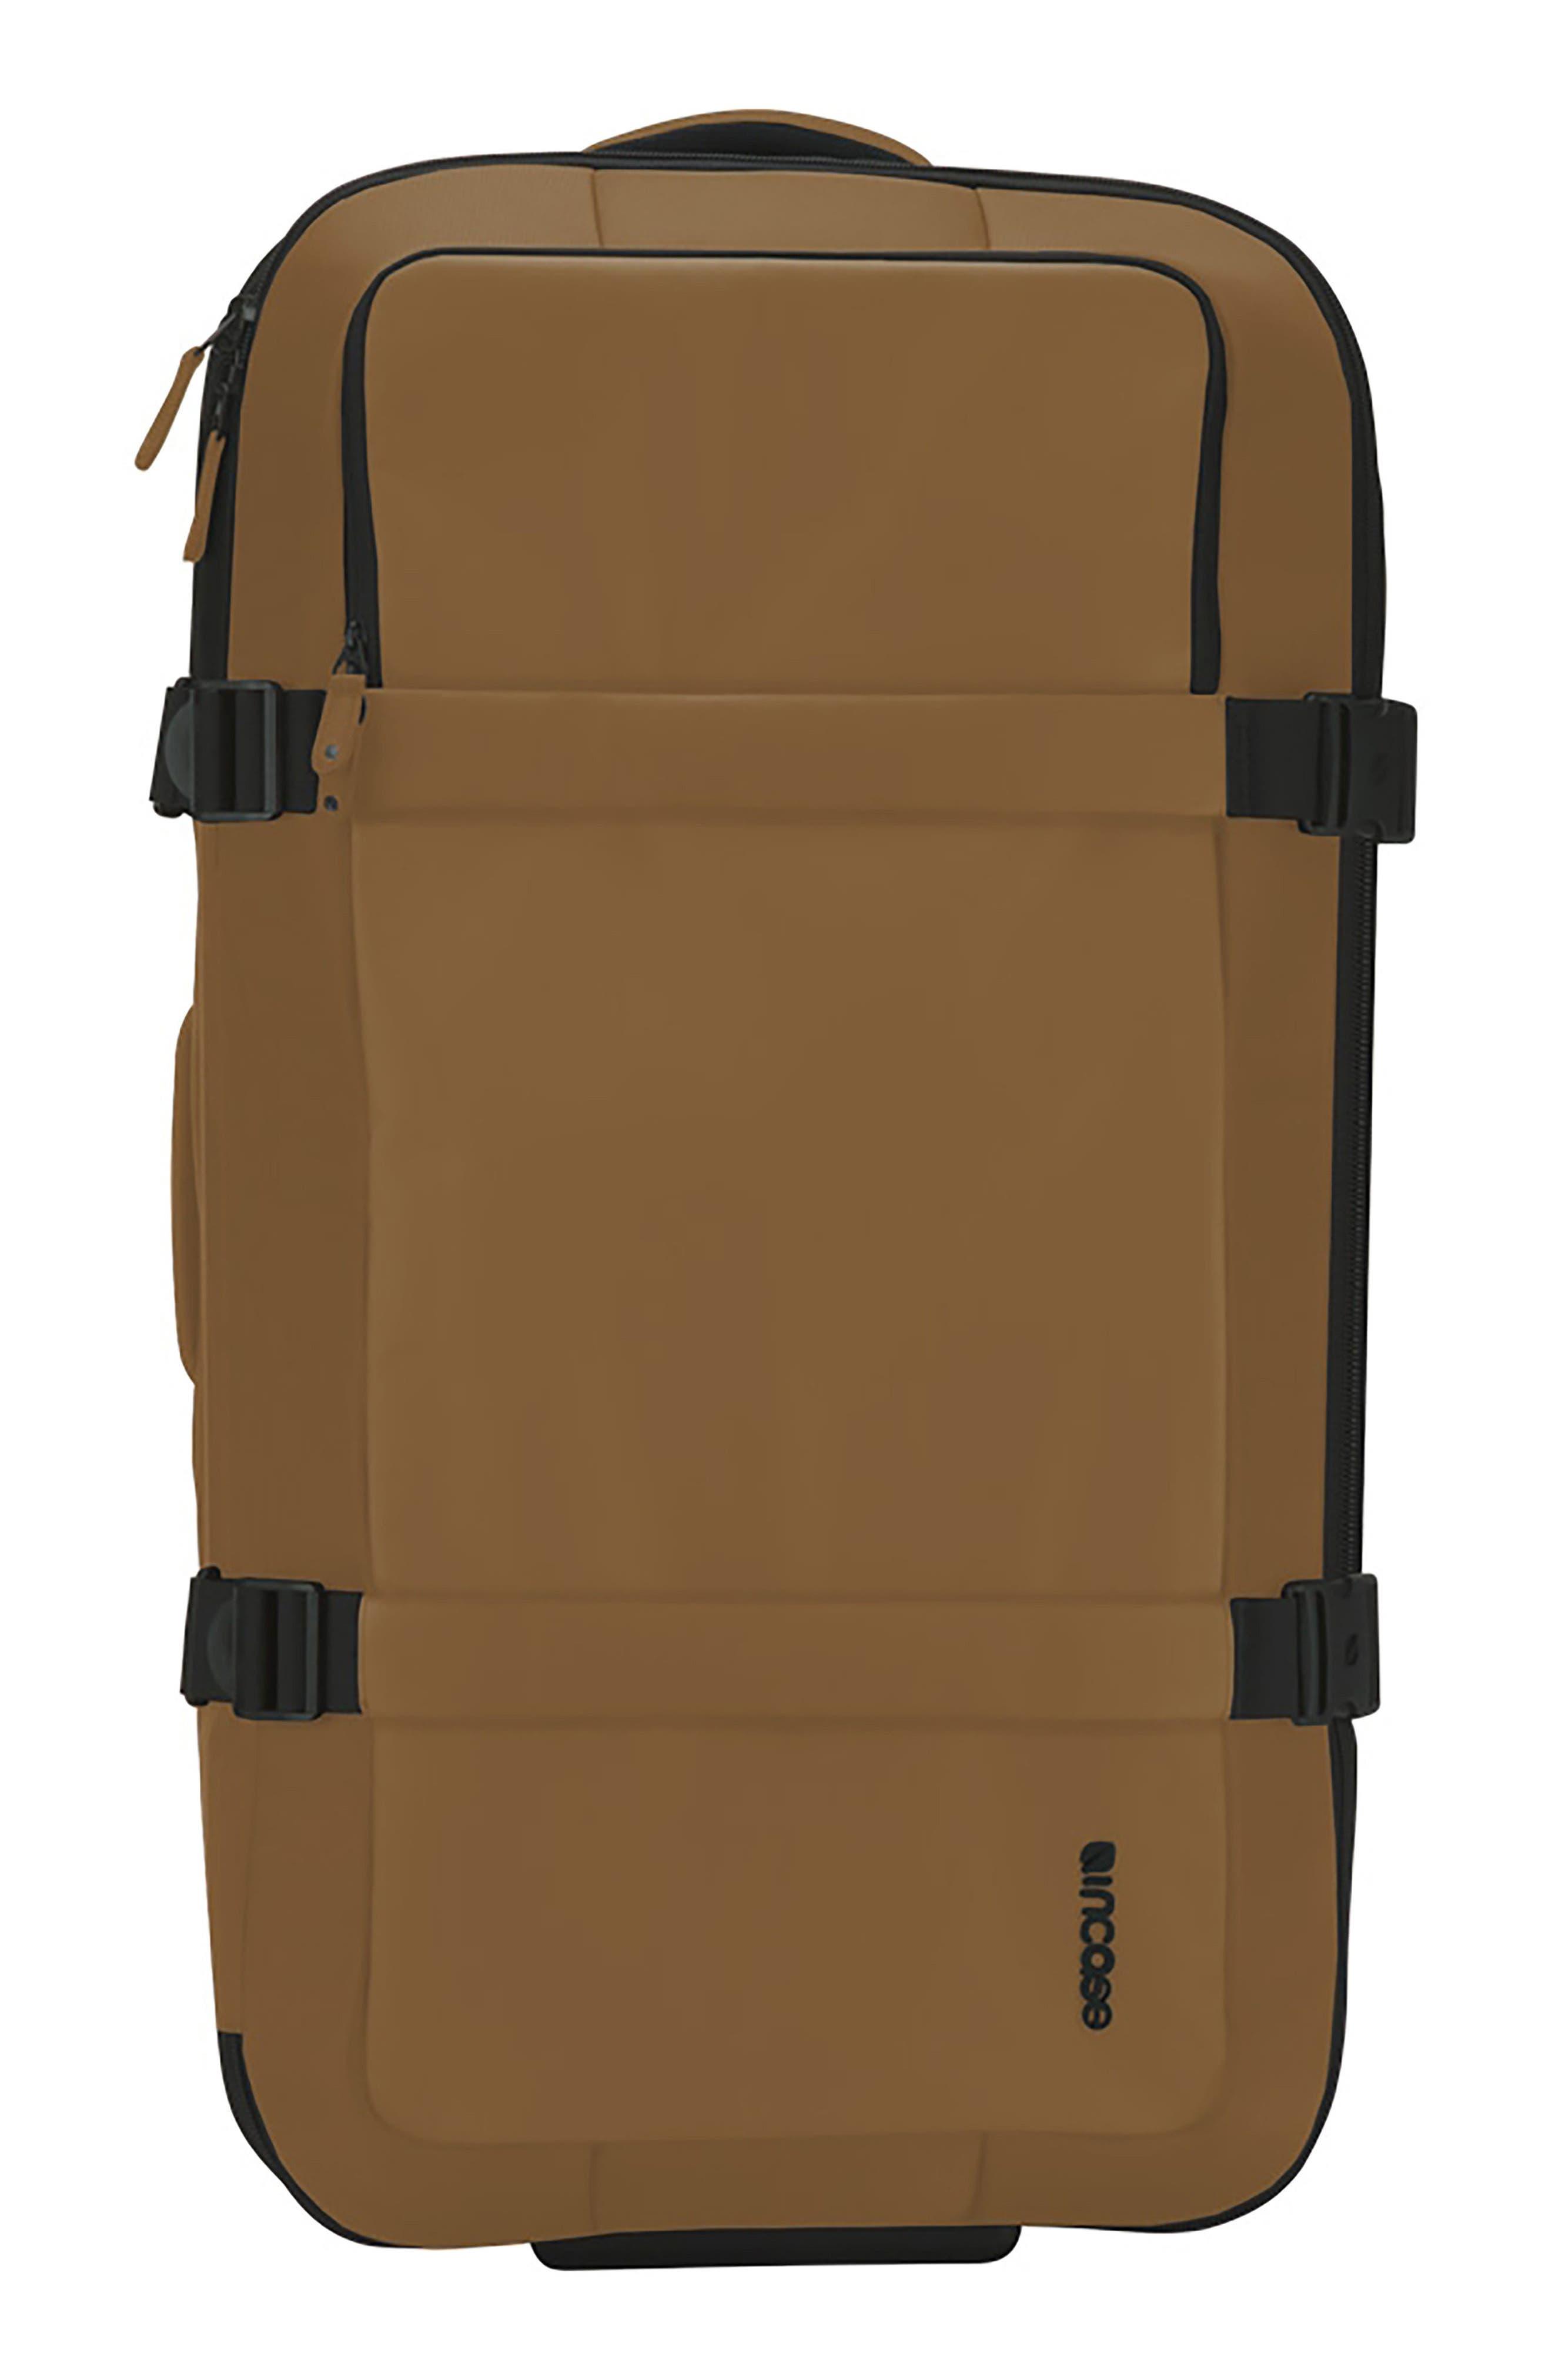 INCASE DESIGNS TRACTO 35 Inch Wheeled Duffel Bag